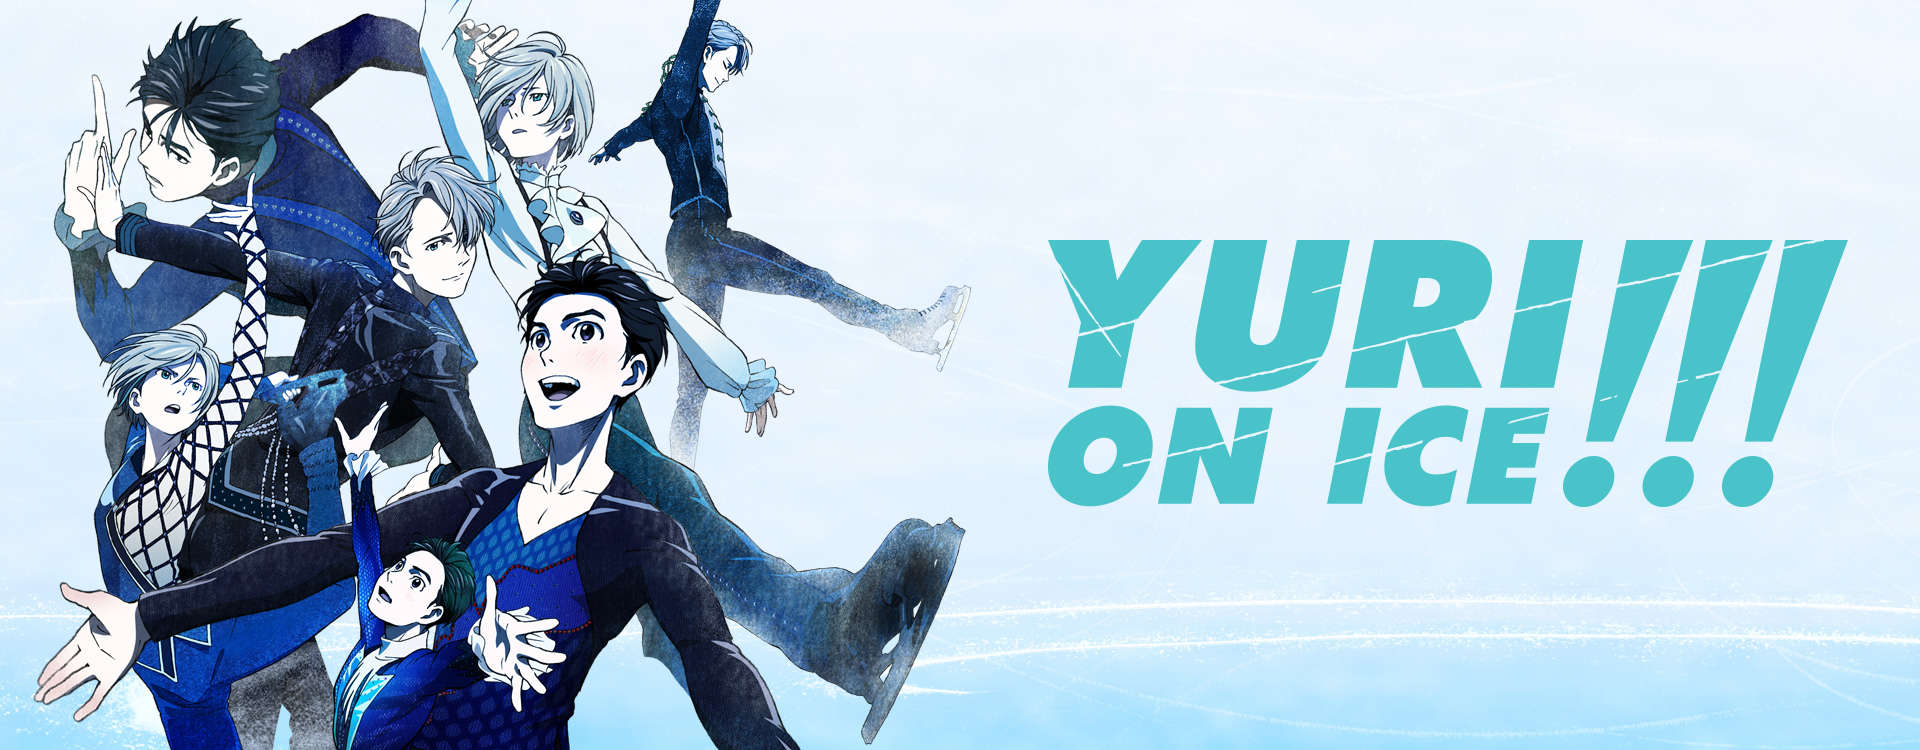 Stream Amp Watch Yuri On Ice Episodes Online Sub Amp Dub